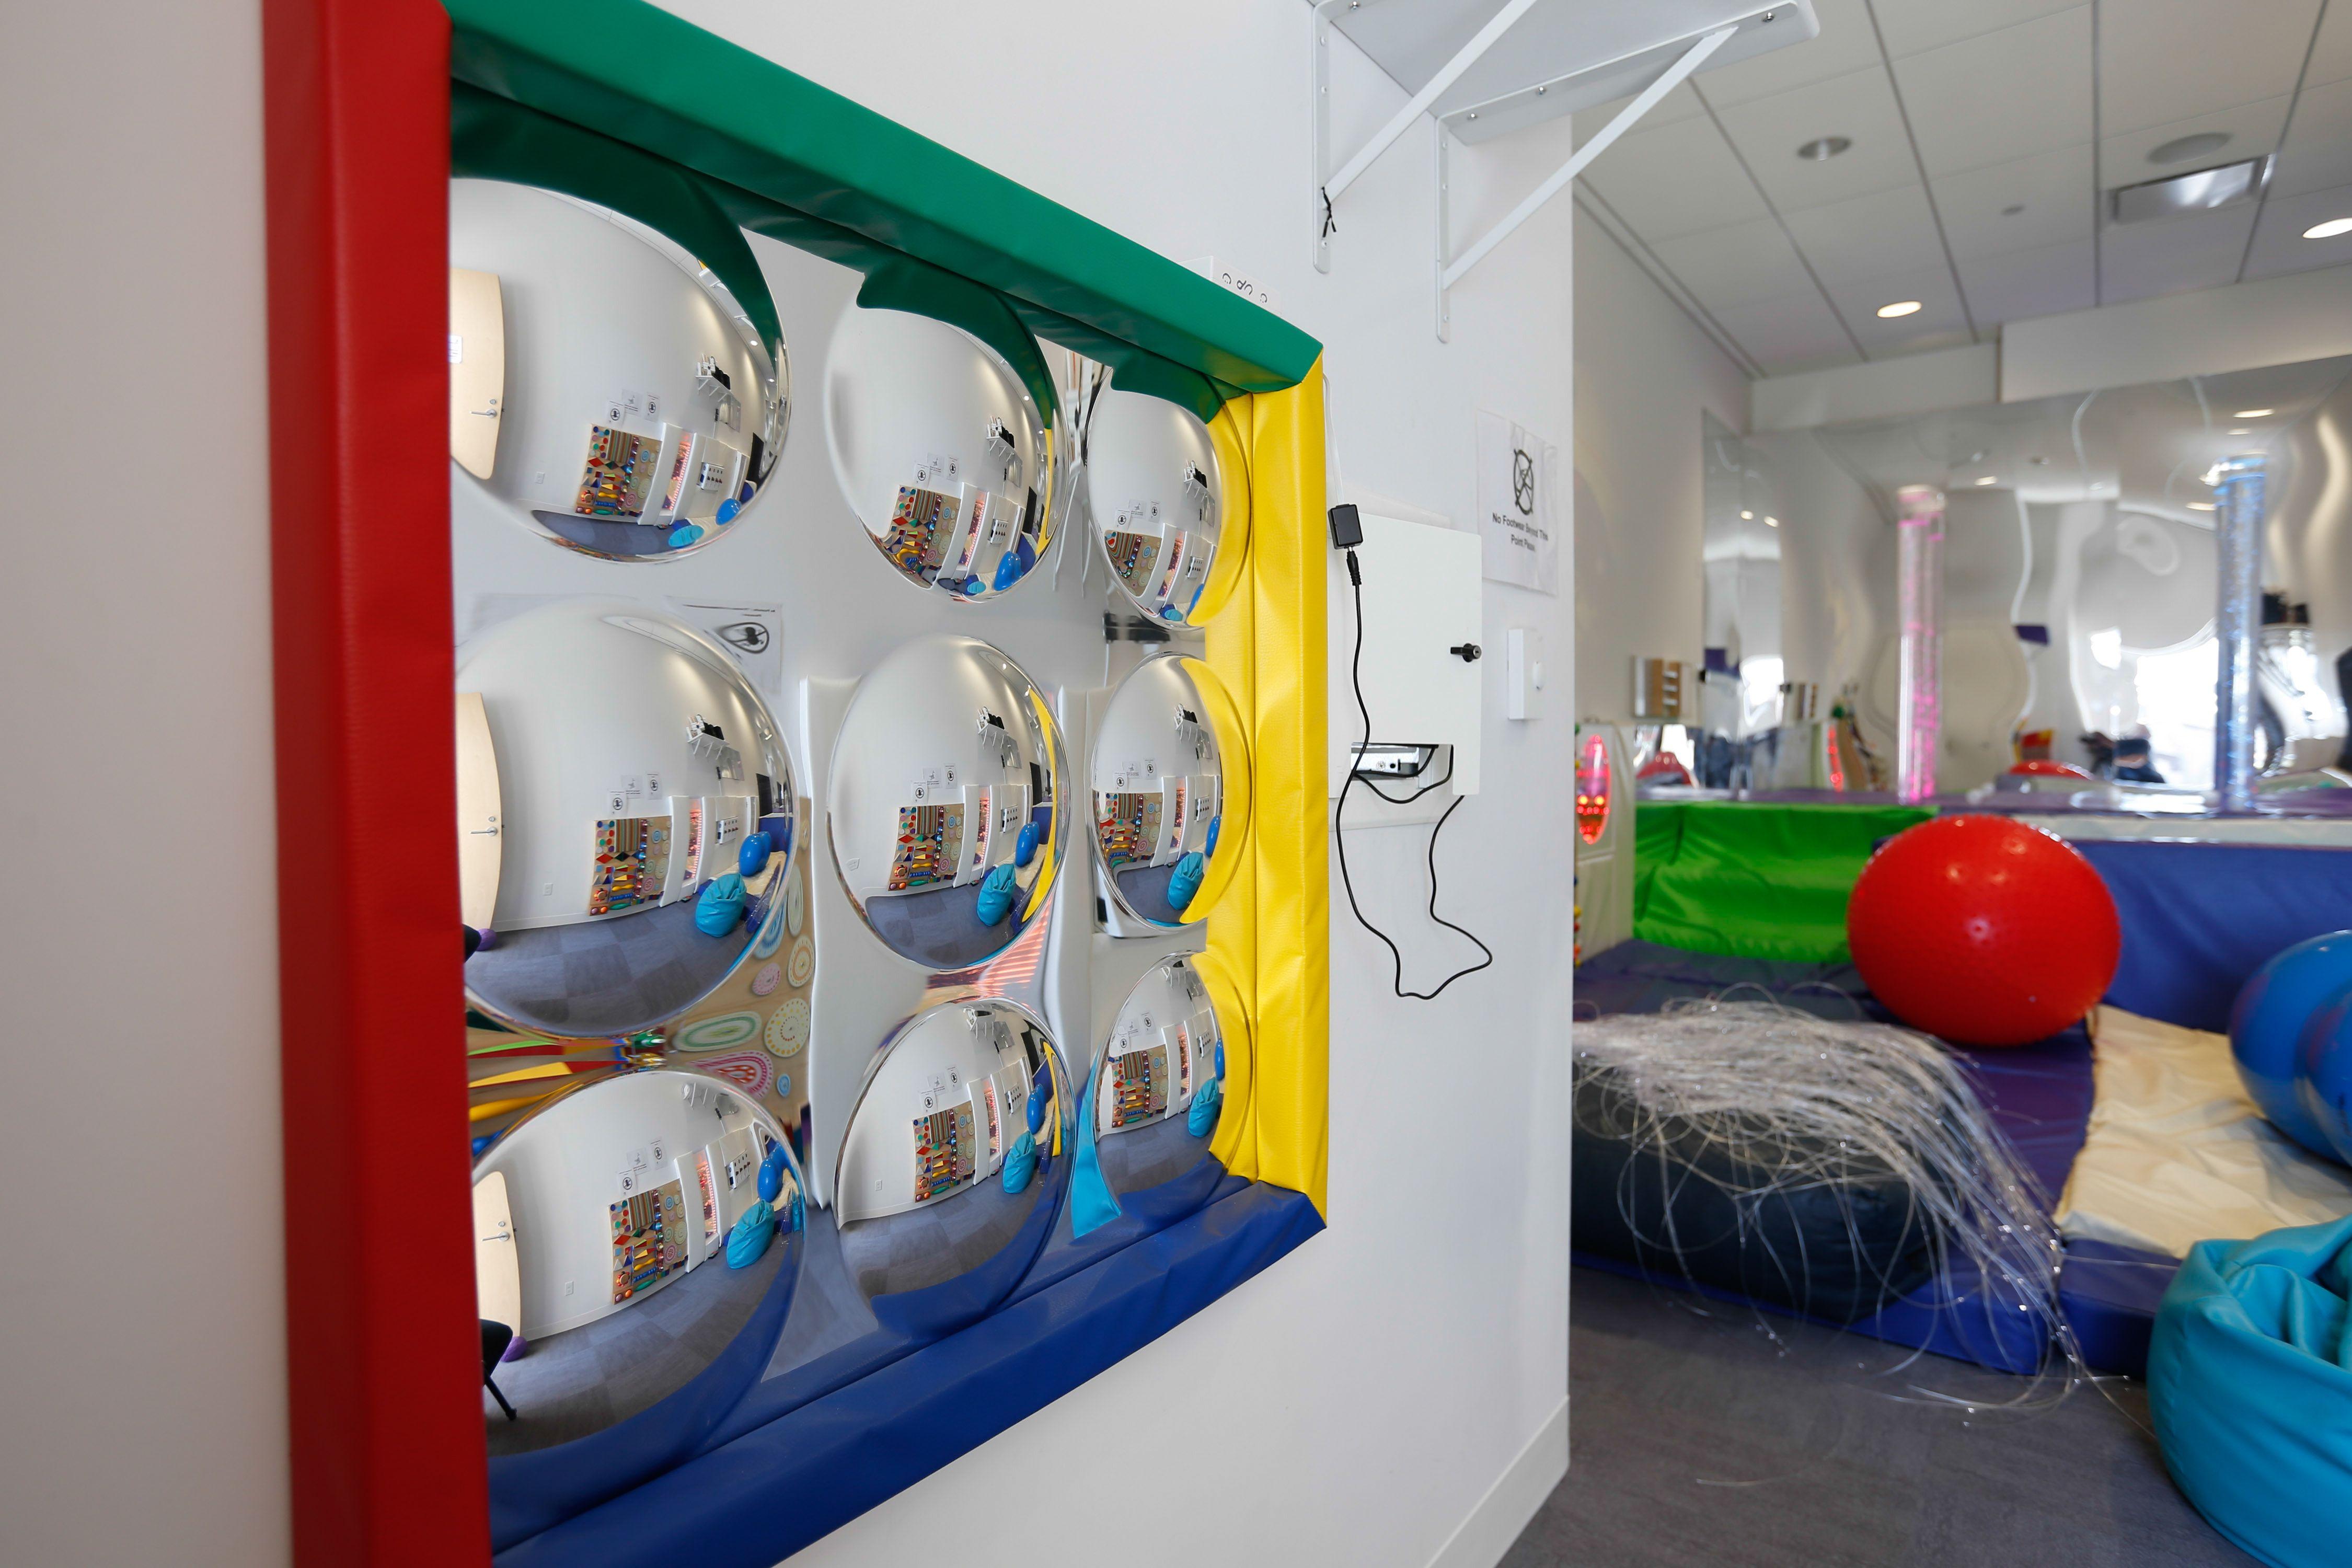 The Multi Sensory Room In Cornell Community Centre Used